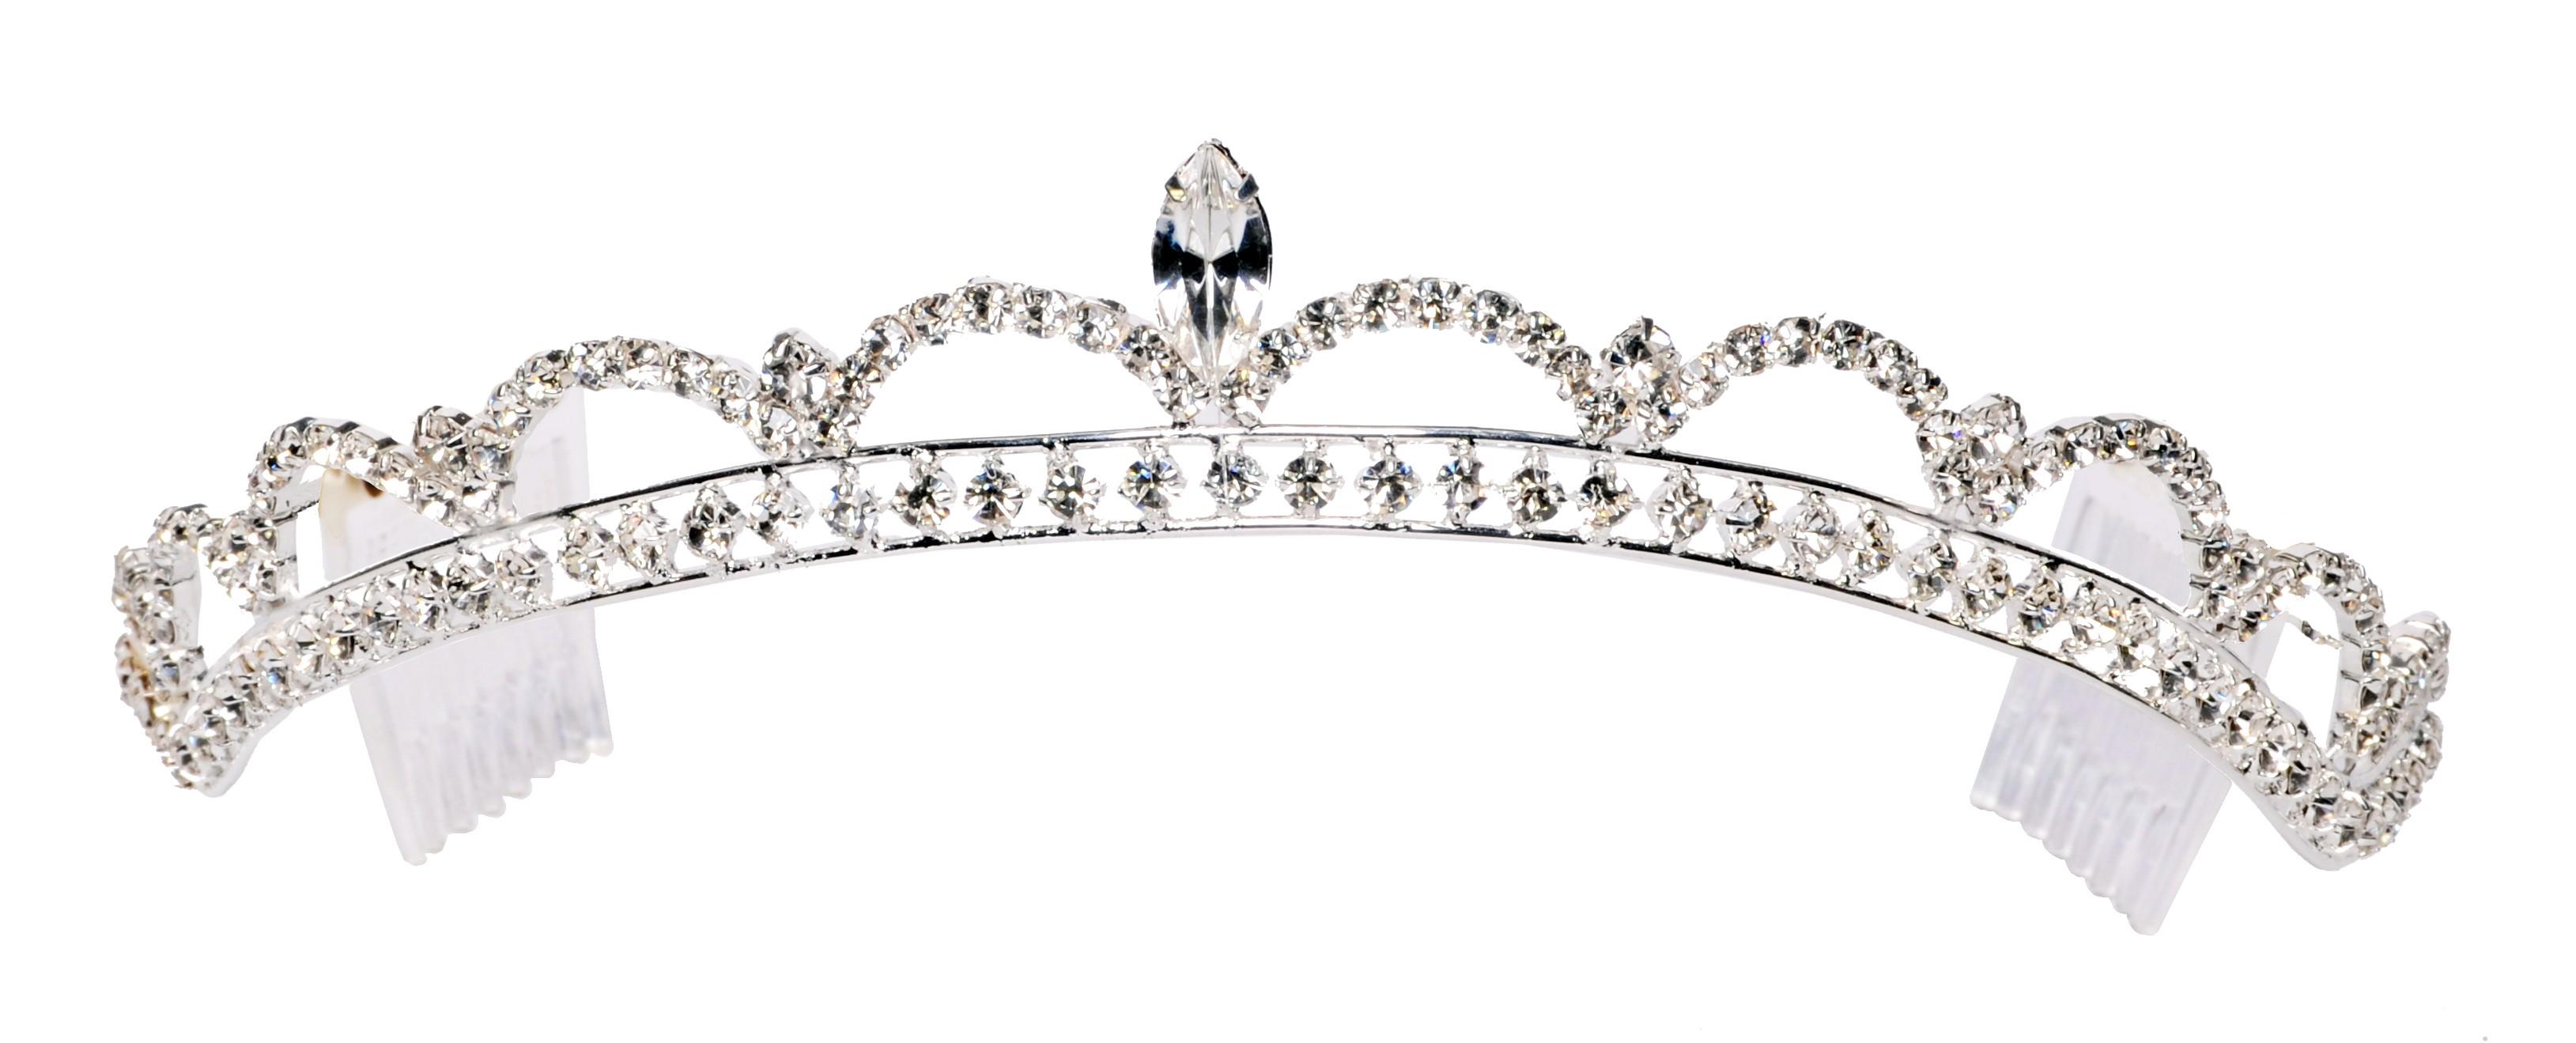 Elizabeth tiara